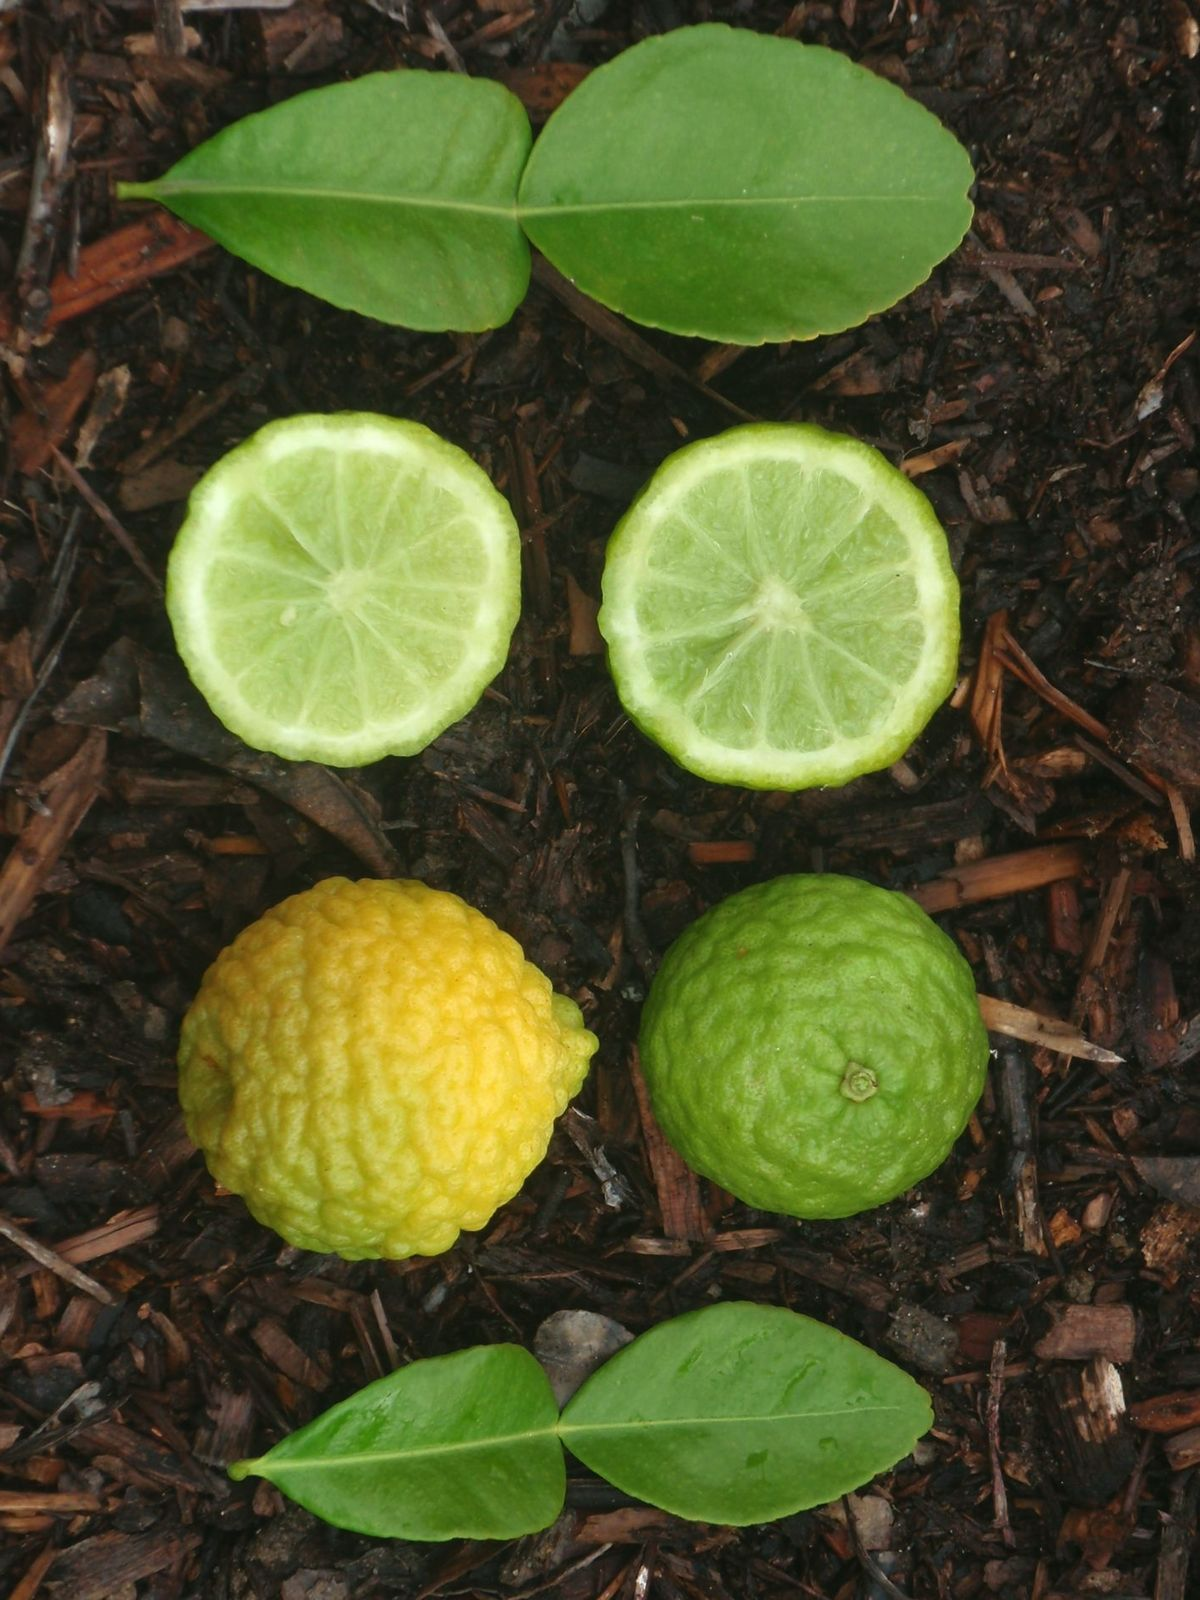 Modern Kaffir Citrus Hystrix Citrus Pages Limes Difference Between Lime Lemon Orange Difference Between Lime Lemon Plant houzz 01 Difference Between Lime And Lemon